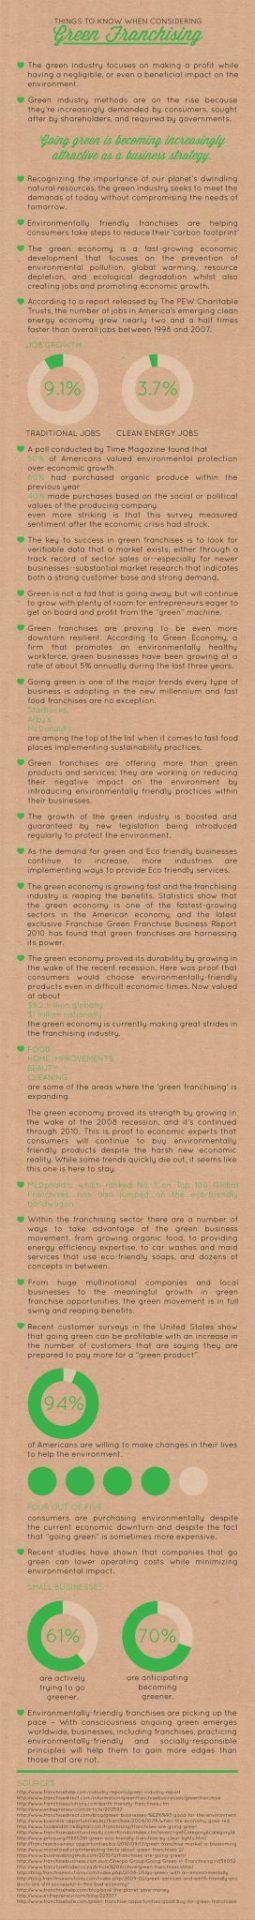 infographic green franchises